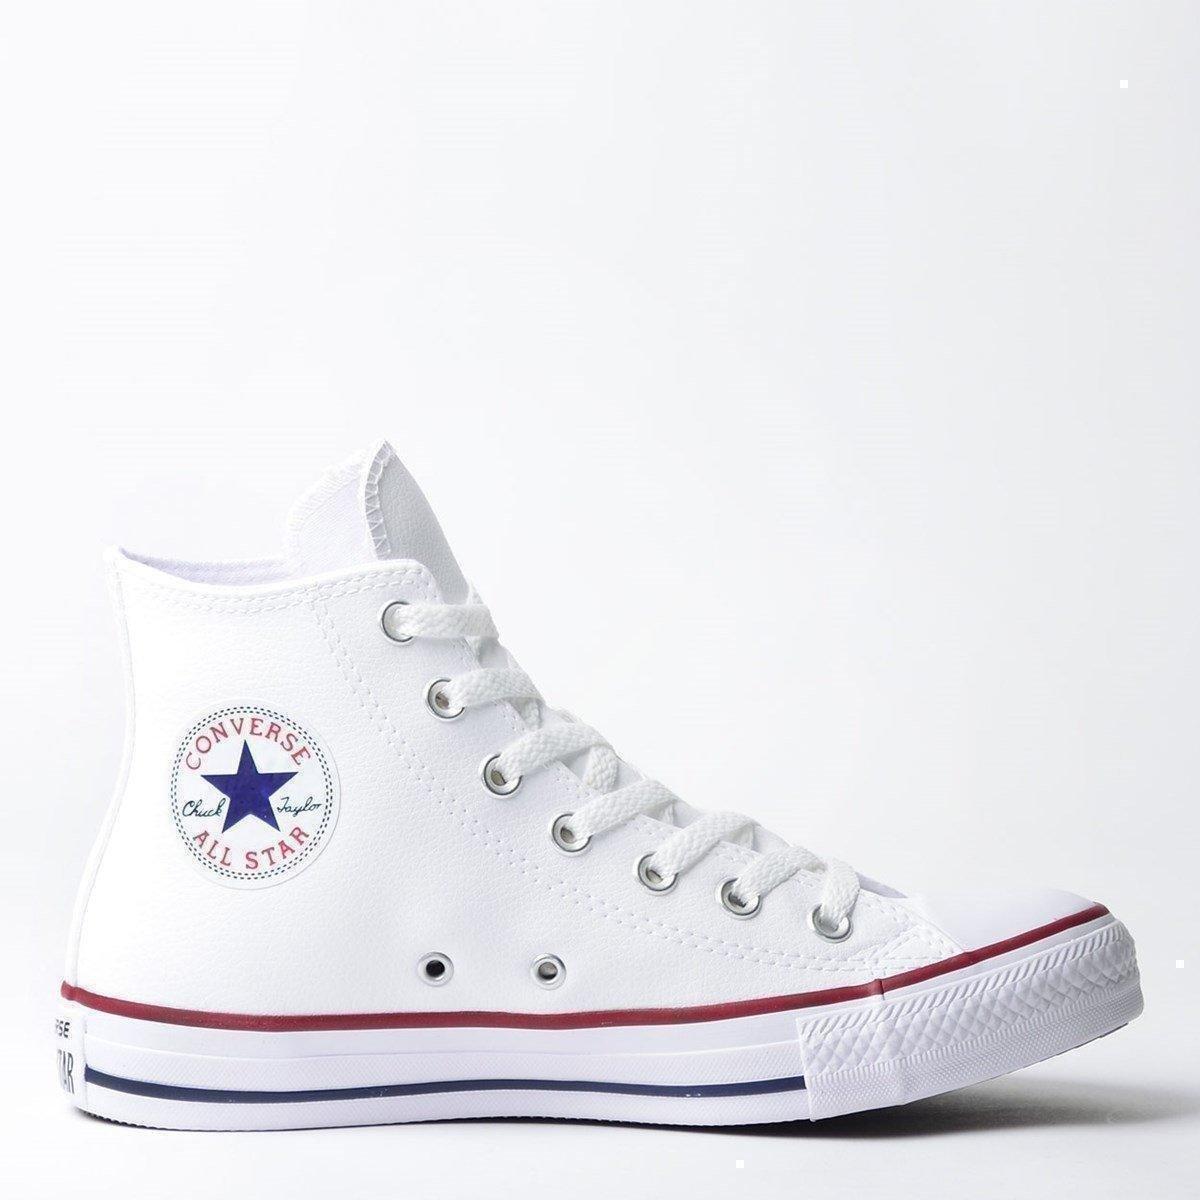 a87cc9c7cad Tênis Converse Chuck Taylor All Star - Compre Agora